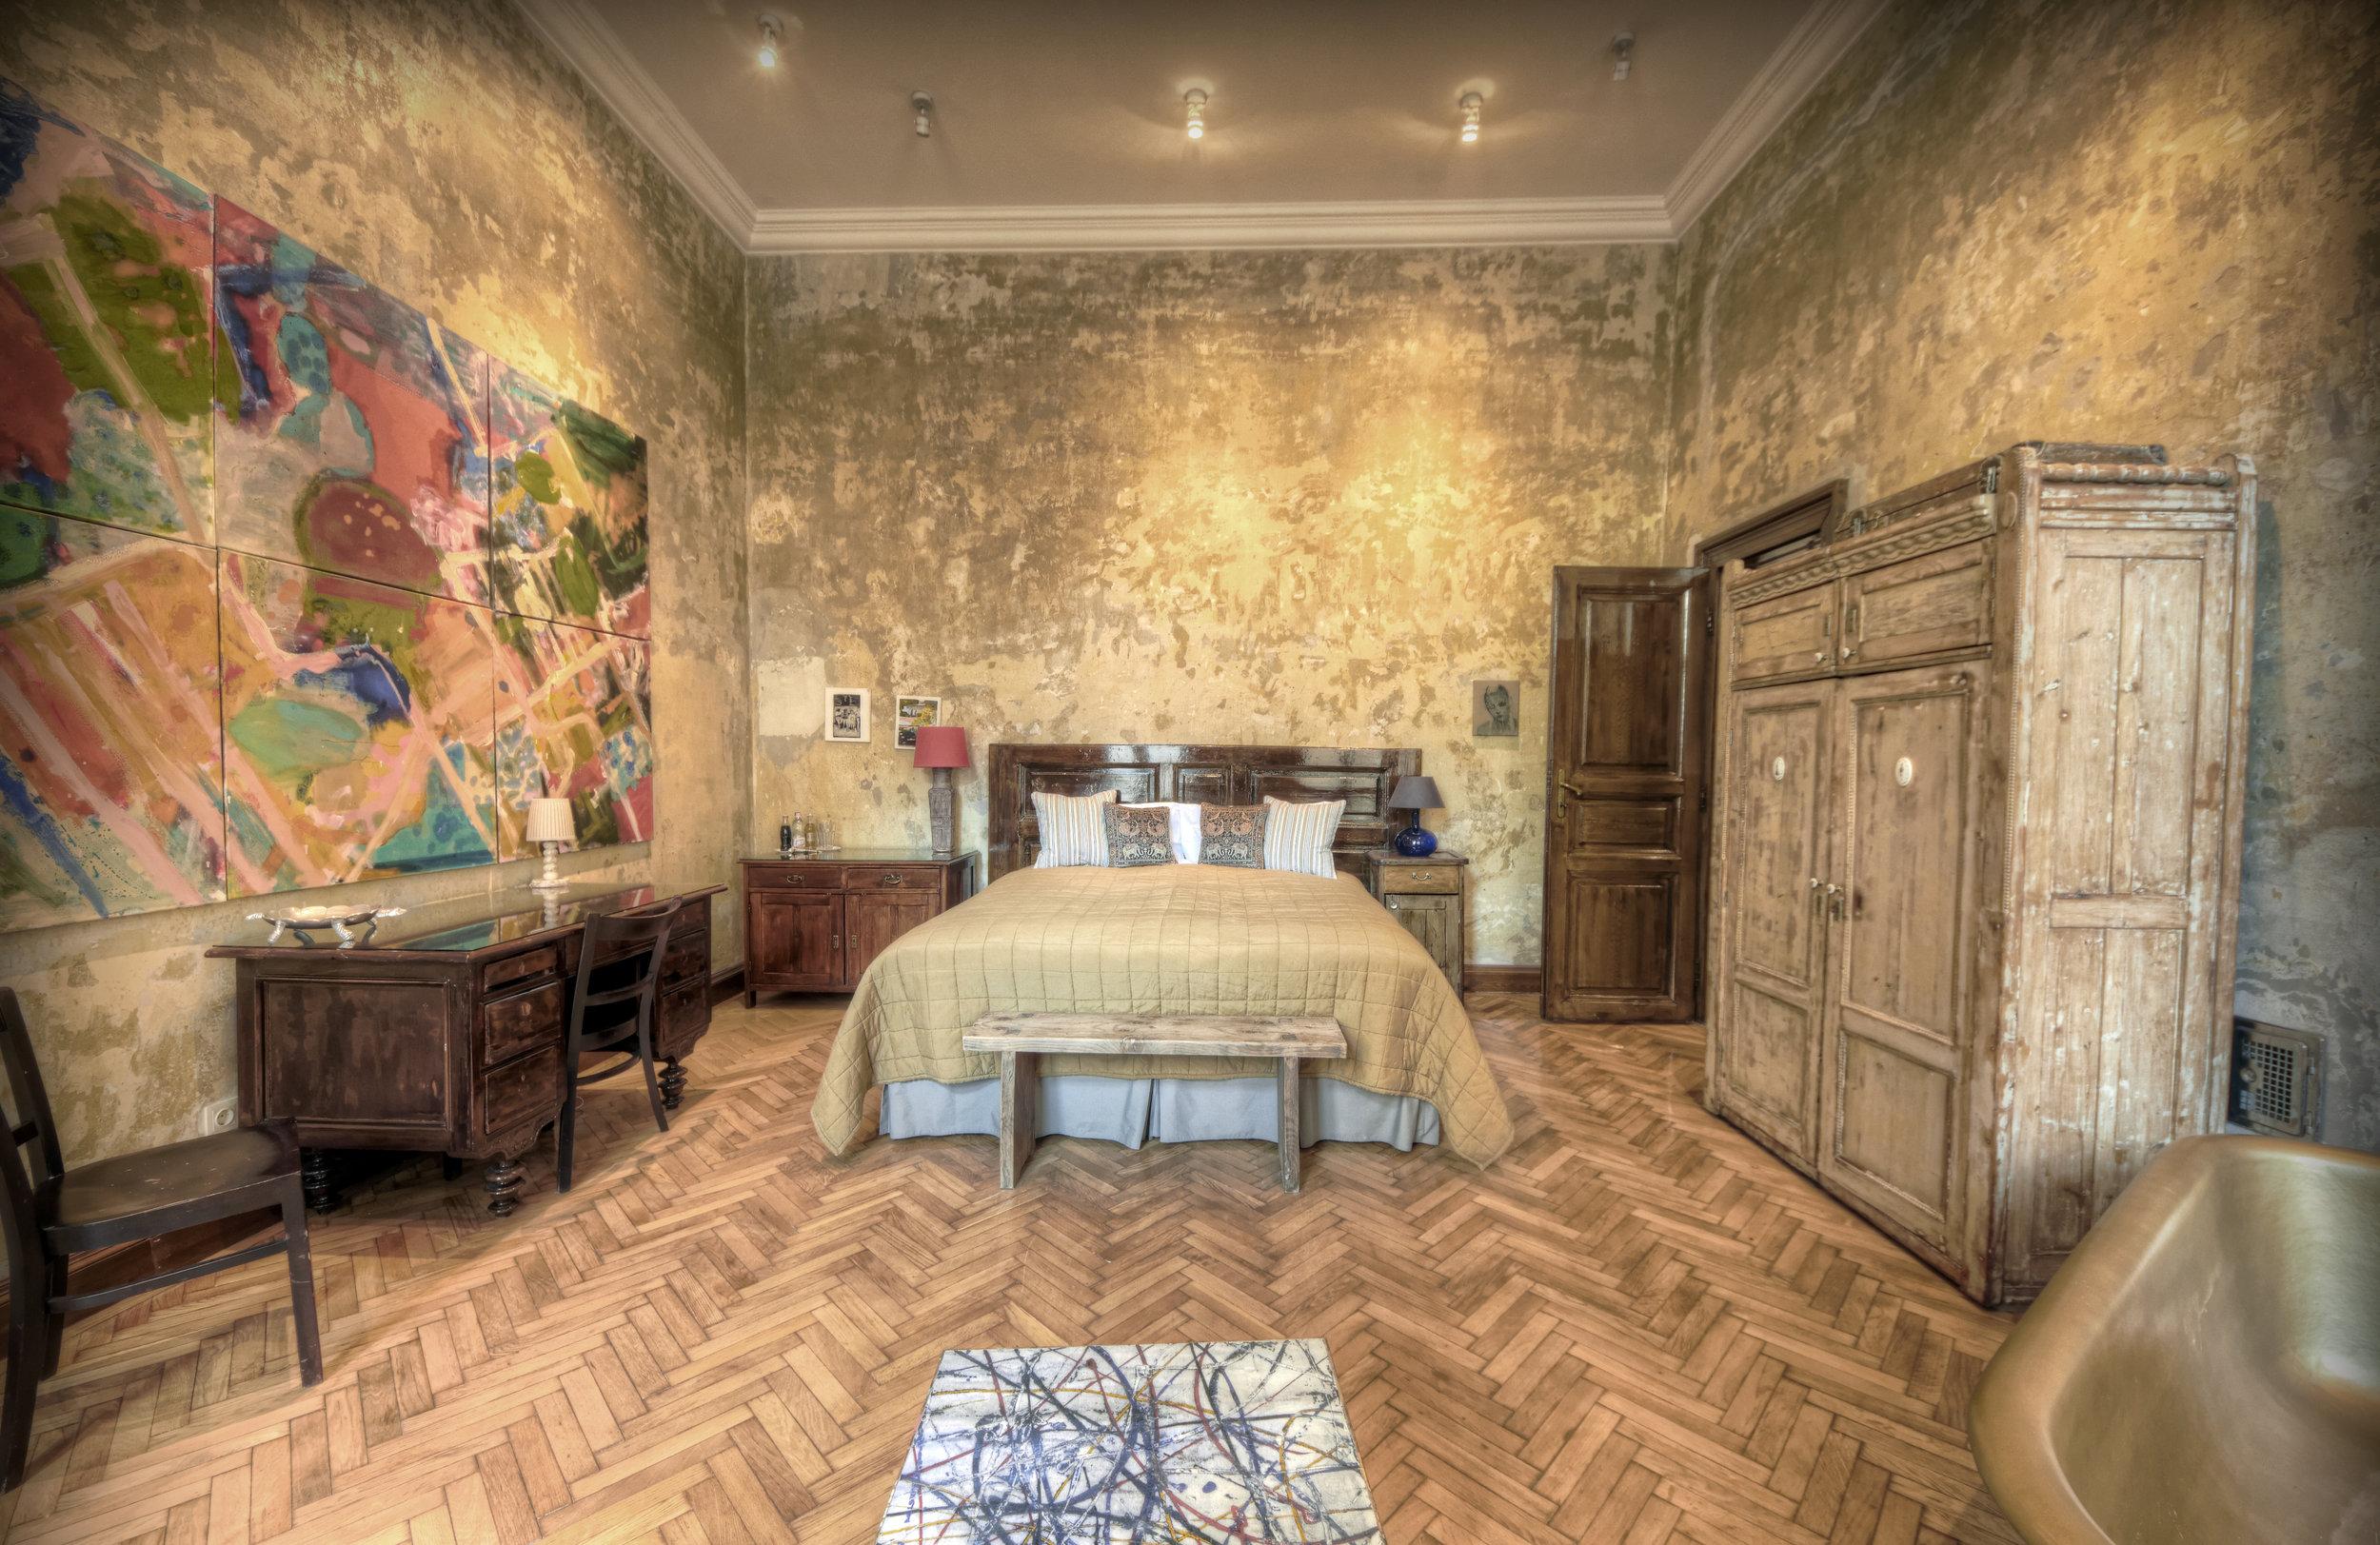 Brody House Ten_Tinei Room.jpg